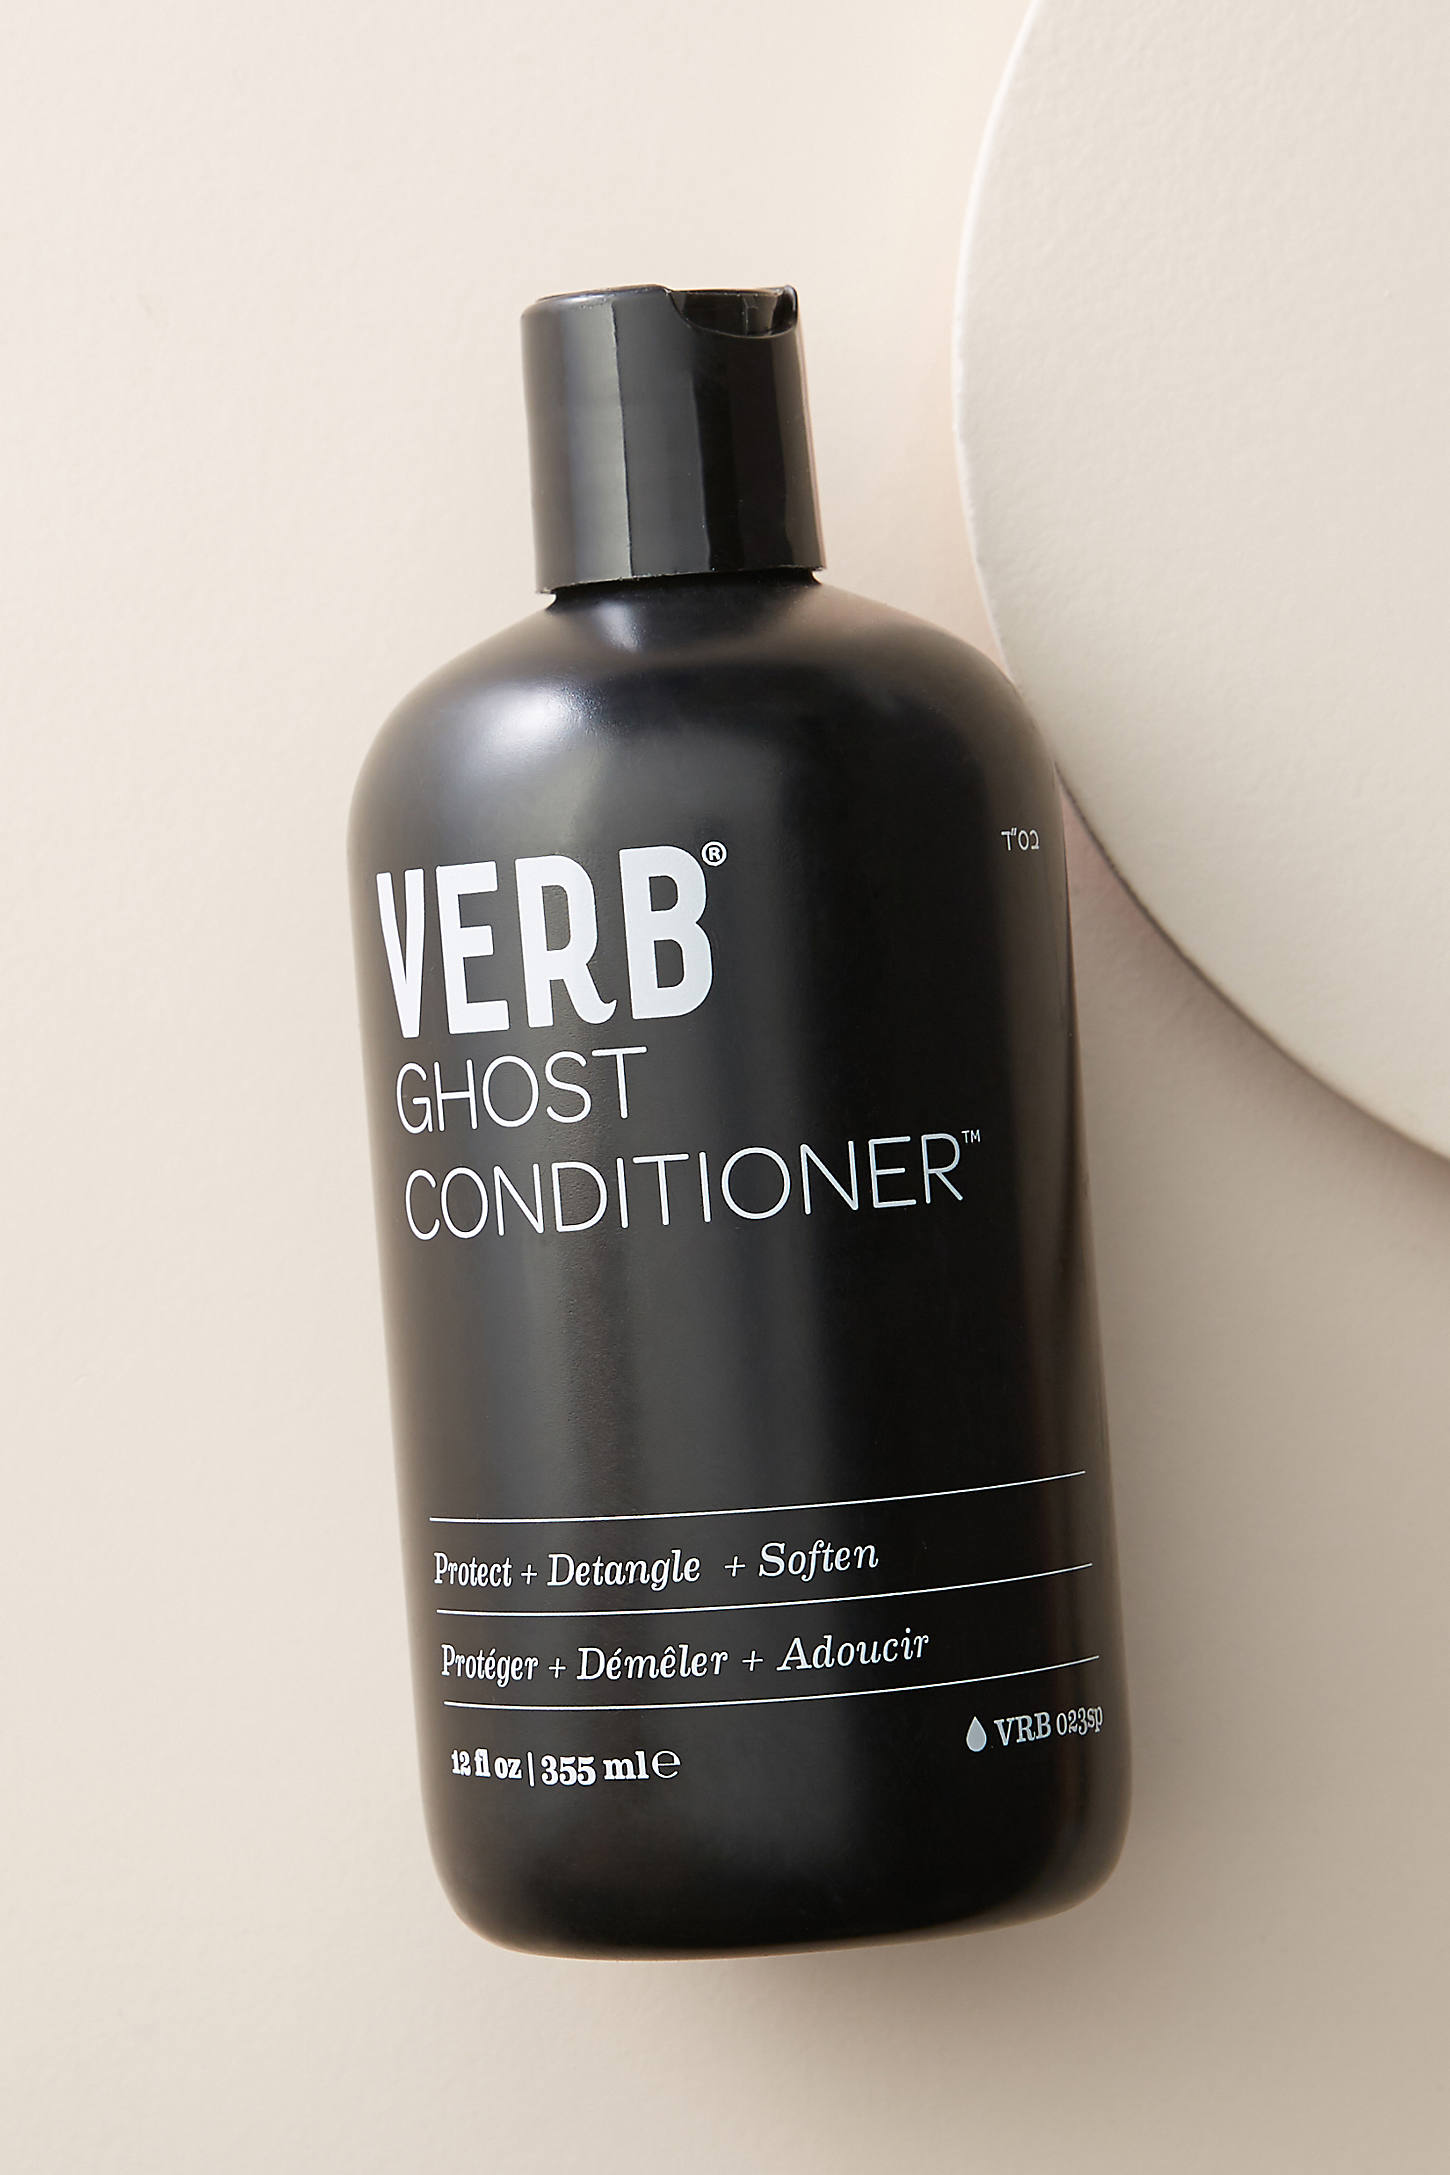 Verb Ghost Conditioner In Black